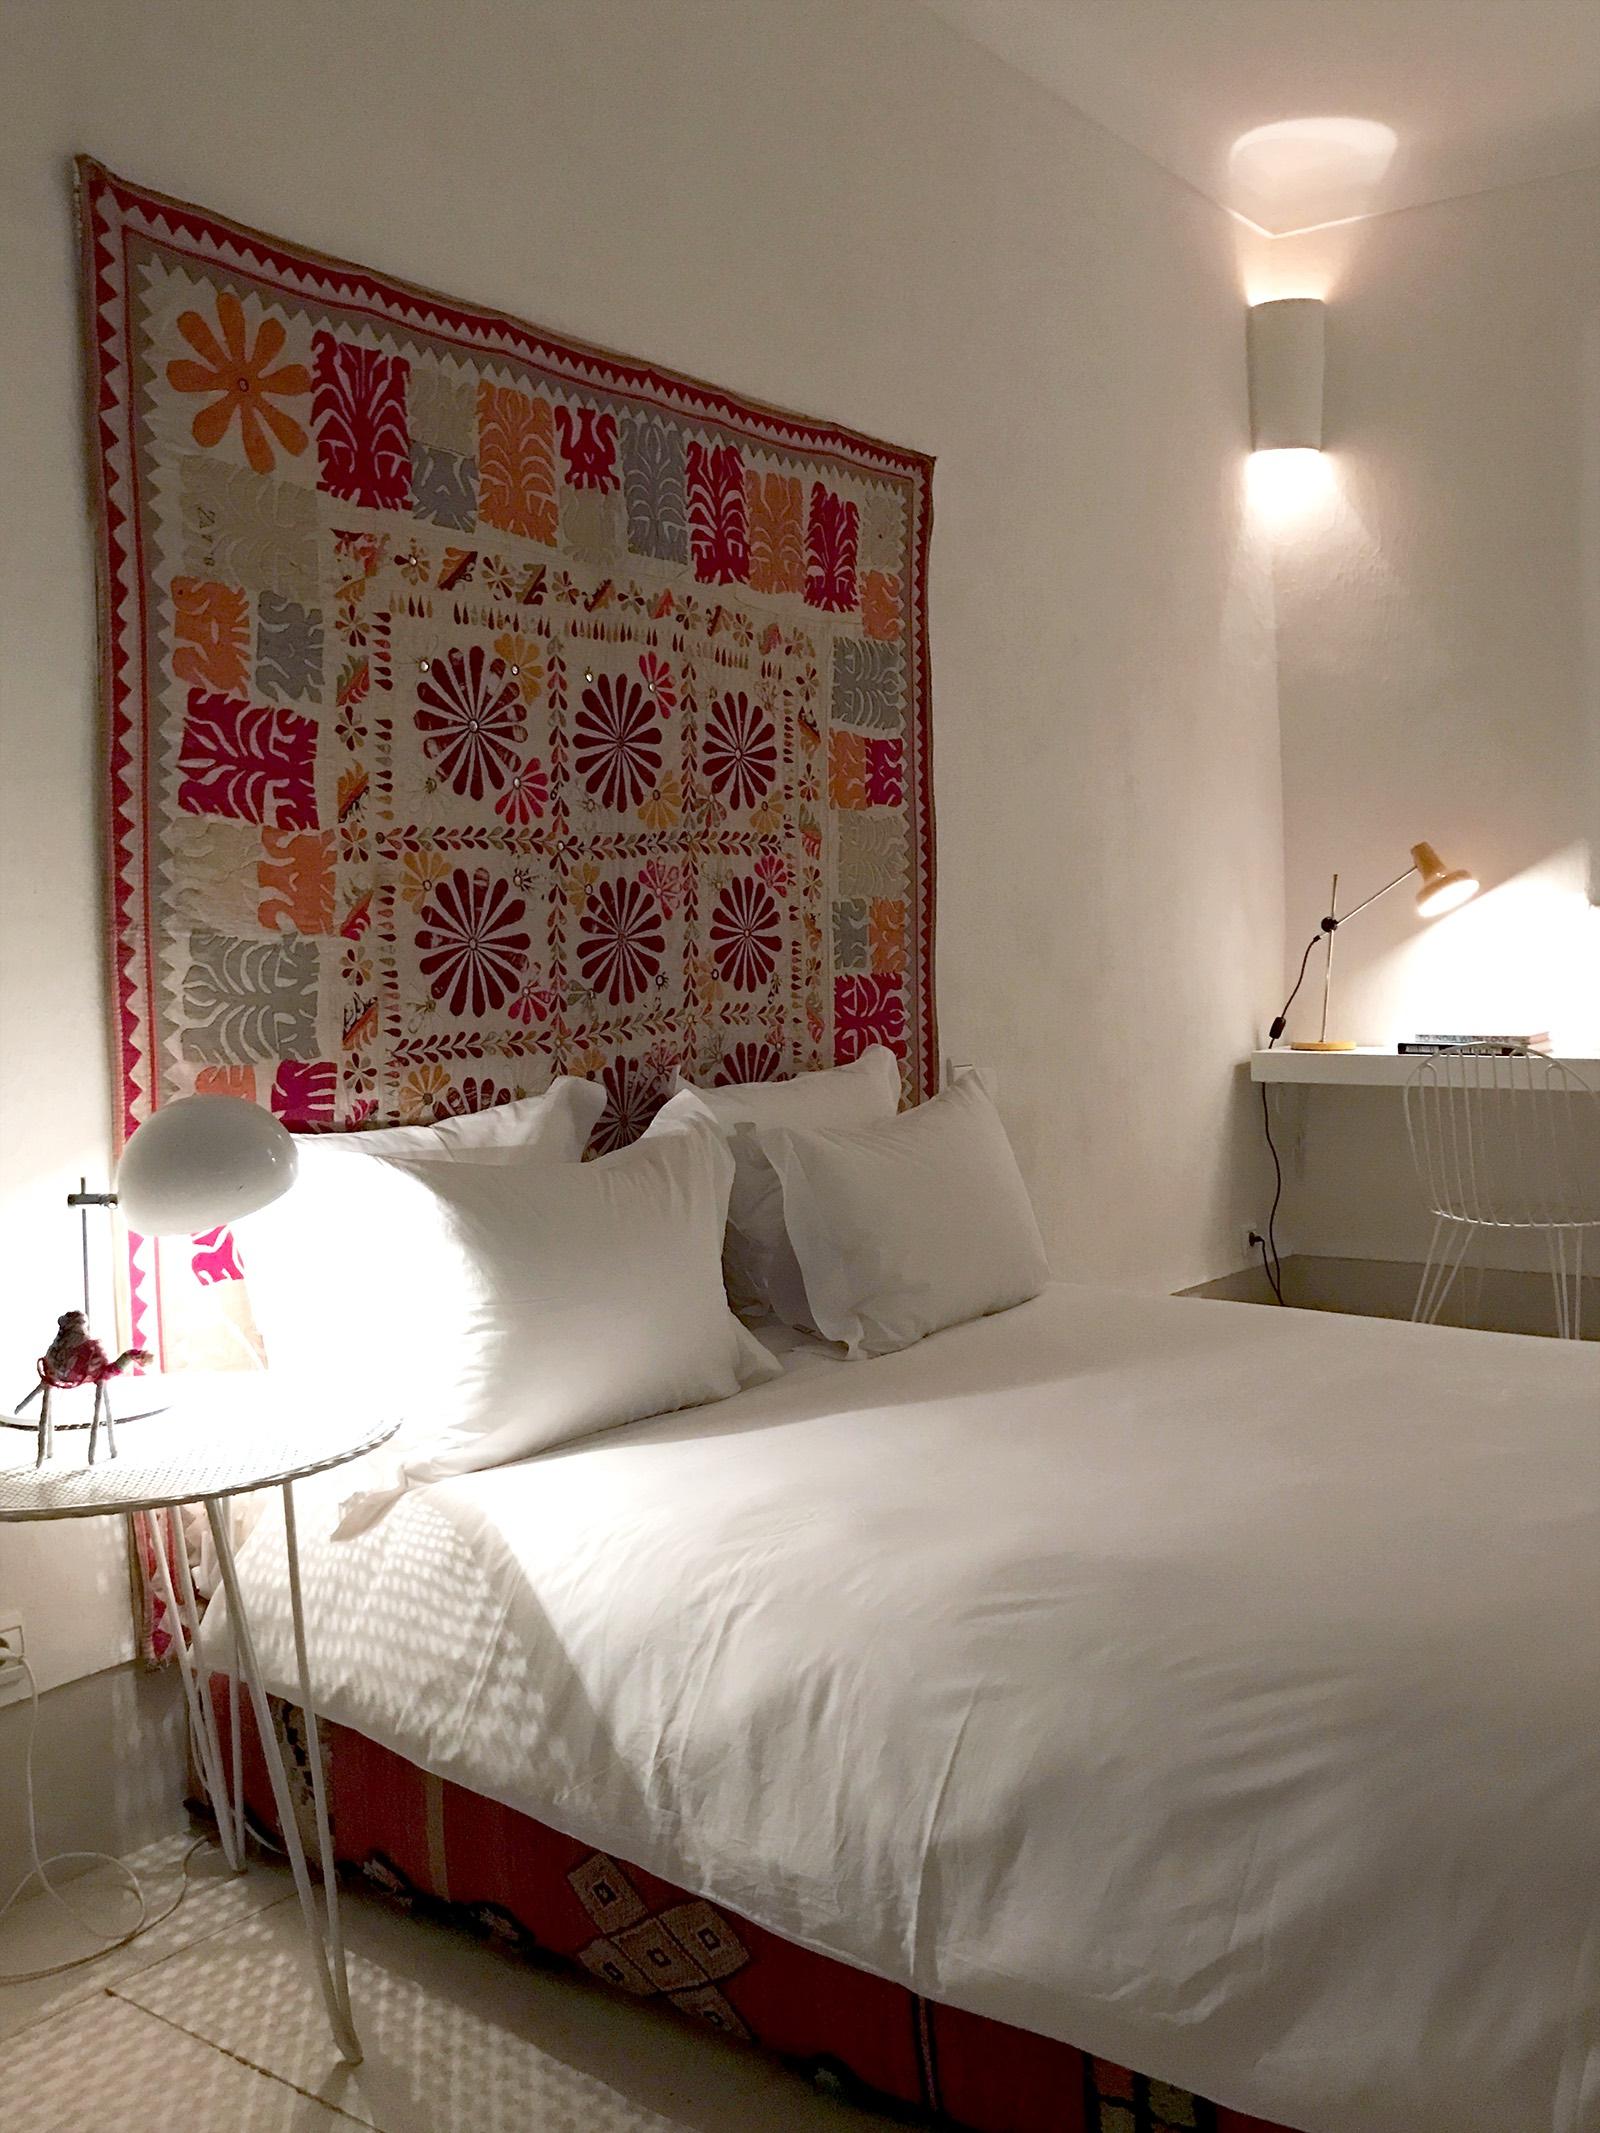 Marrakesh-Riad-Be-Mena-bed-color.jpg